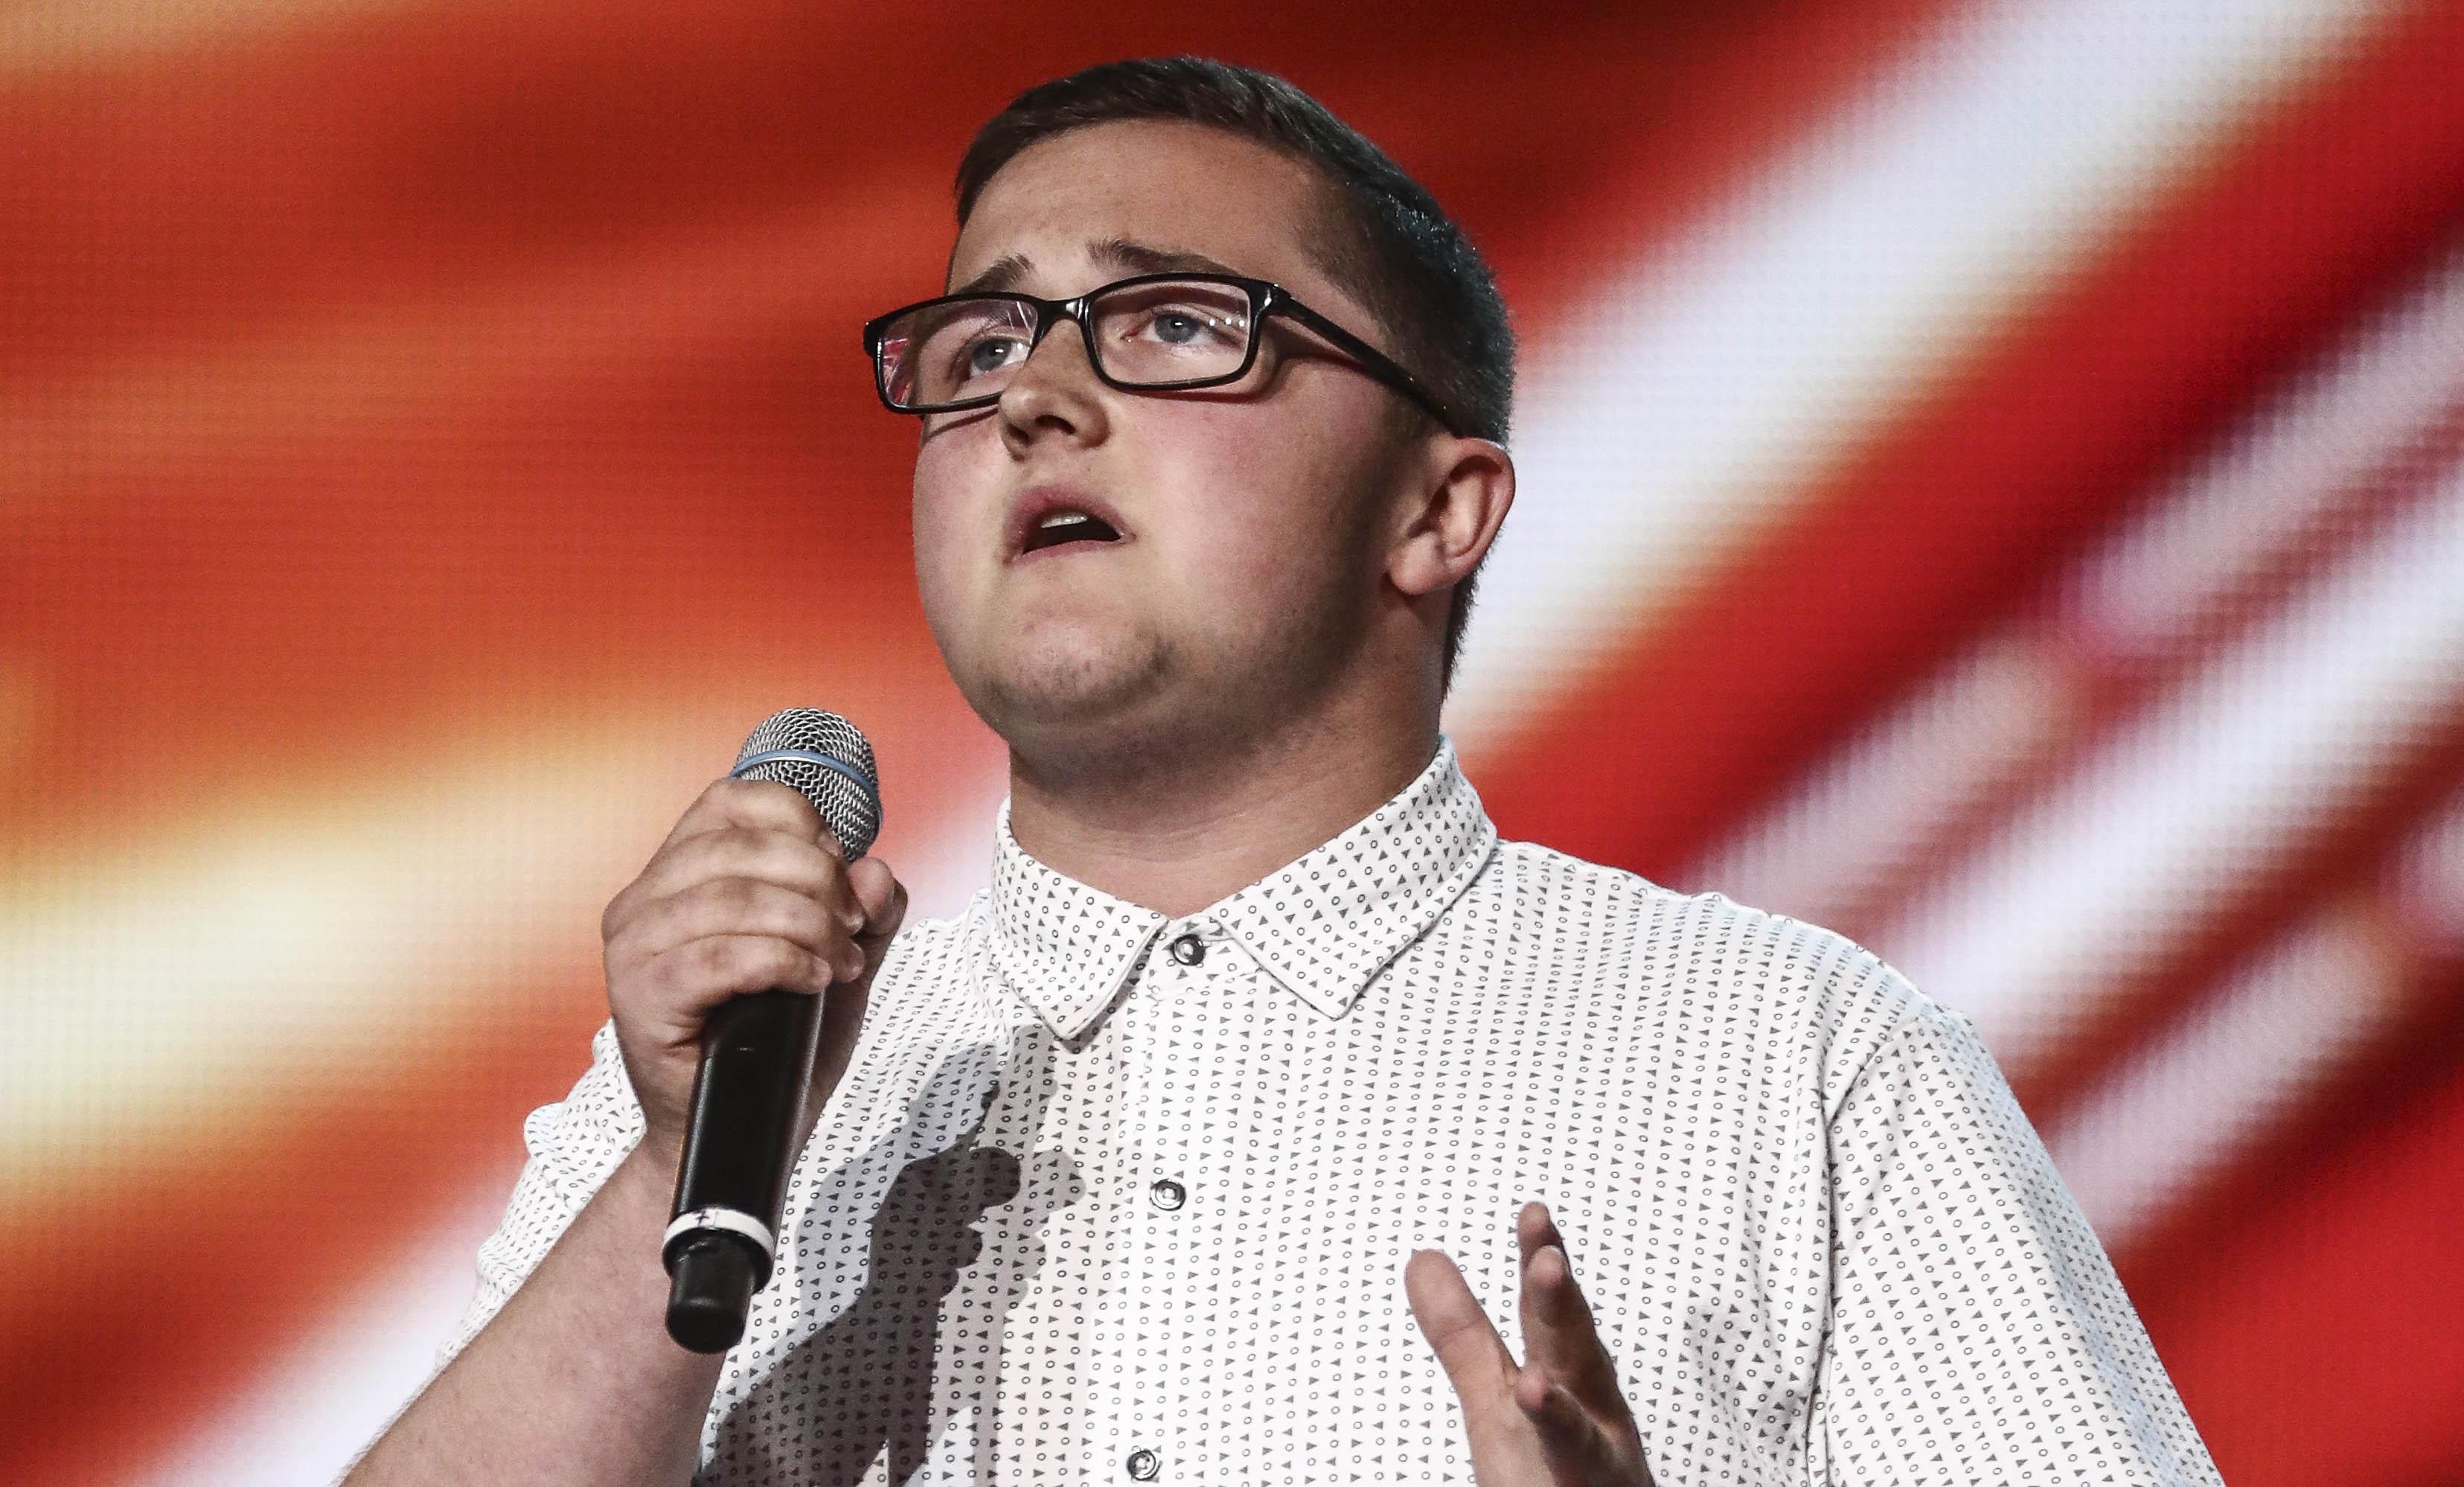 Daniel Quick on The X Factor